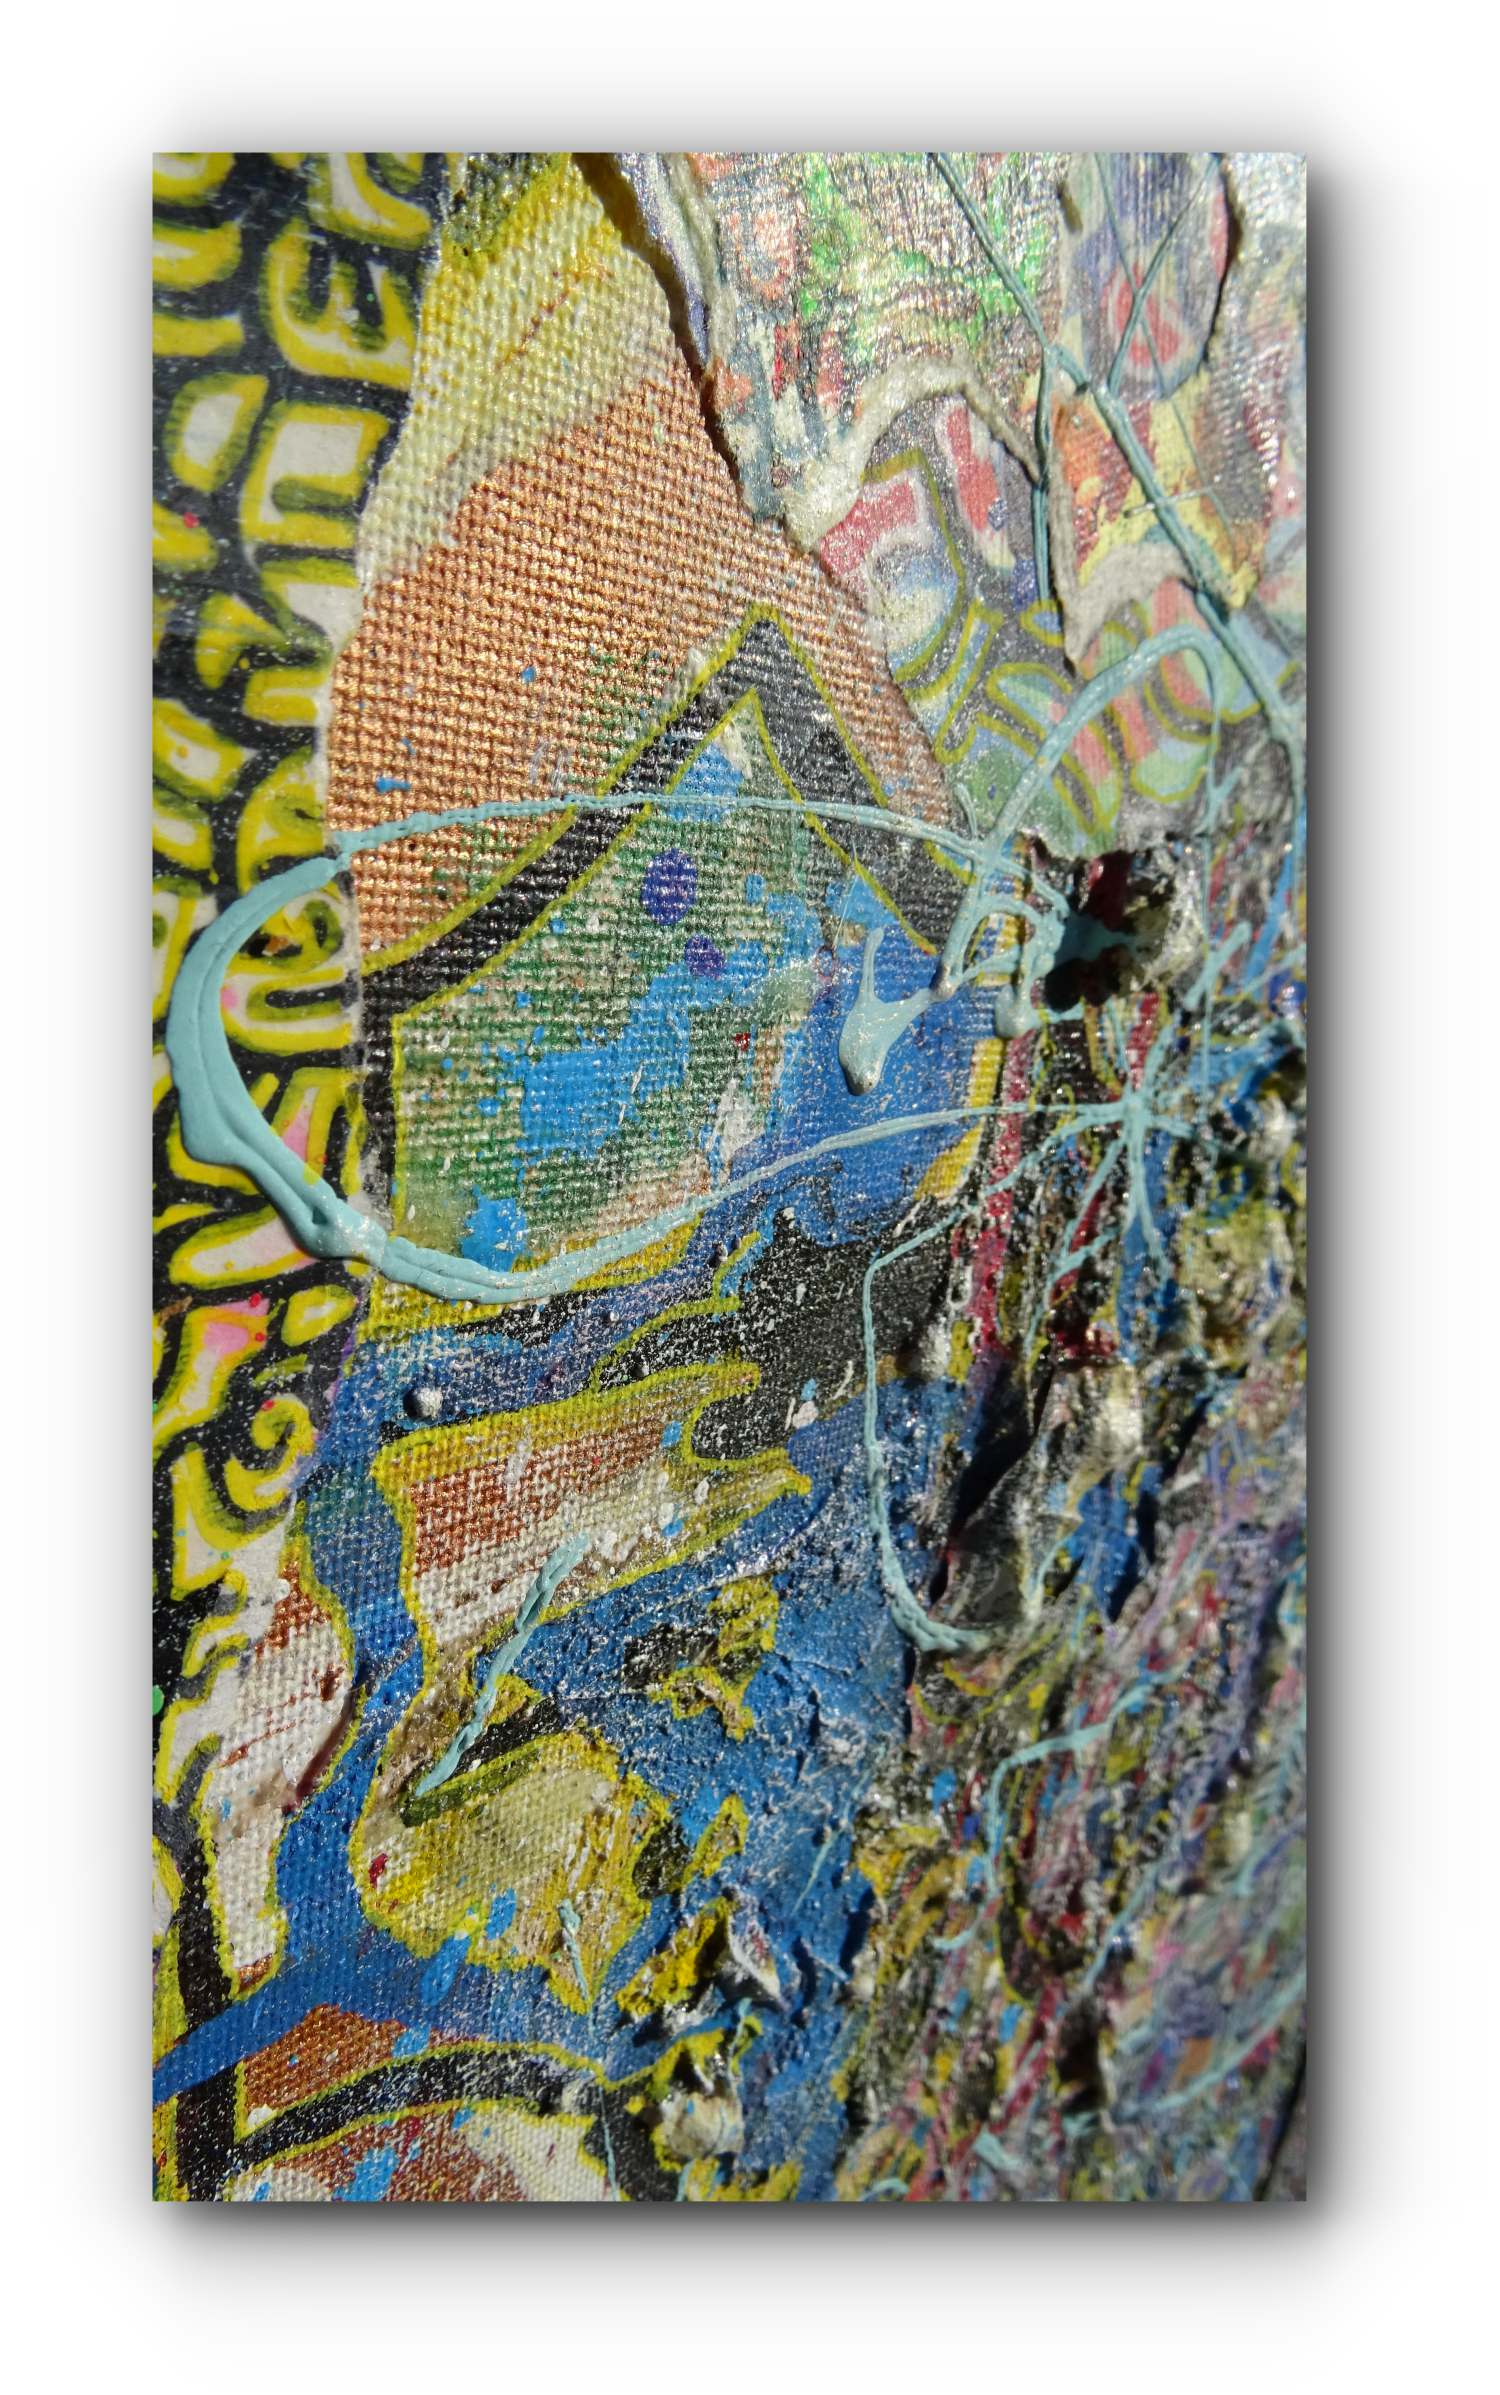 painting-detail-5-pillars-cosmos-artists-ingress-vortices.jpg